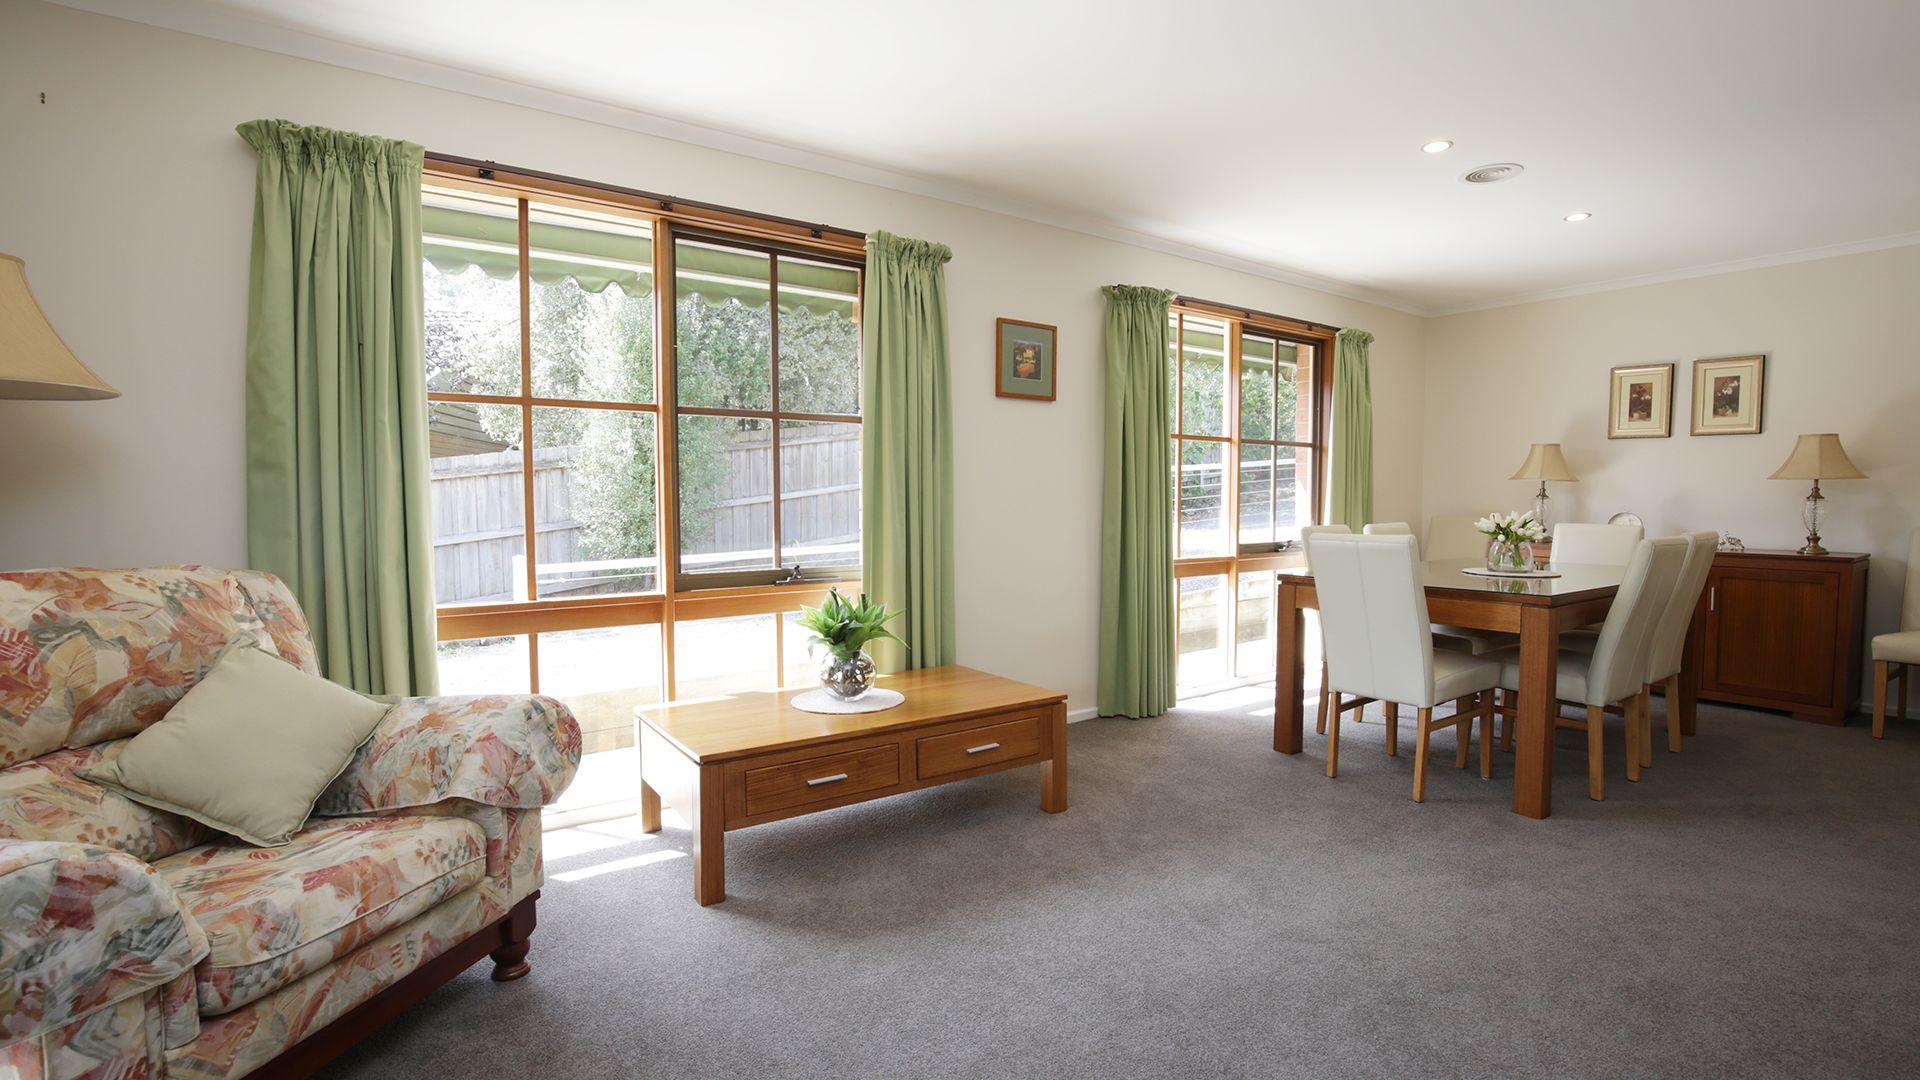 8 Woodside Court, Ballarat North VIC 3350, Image 2